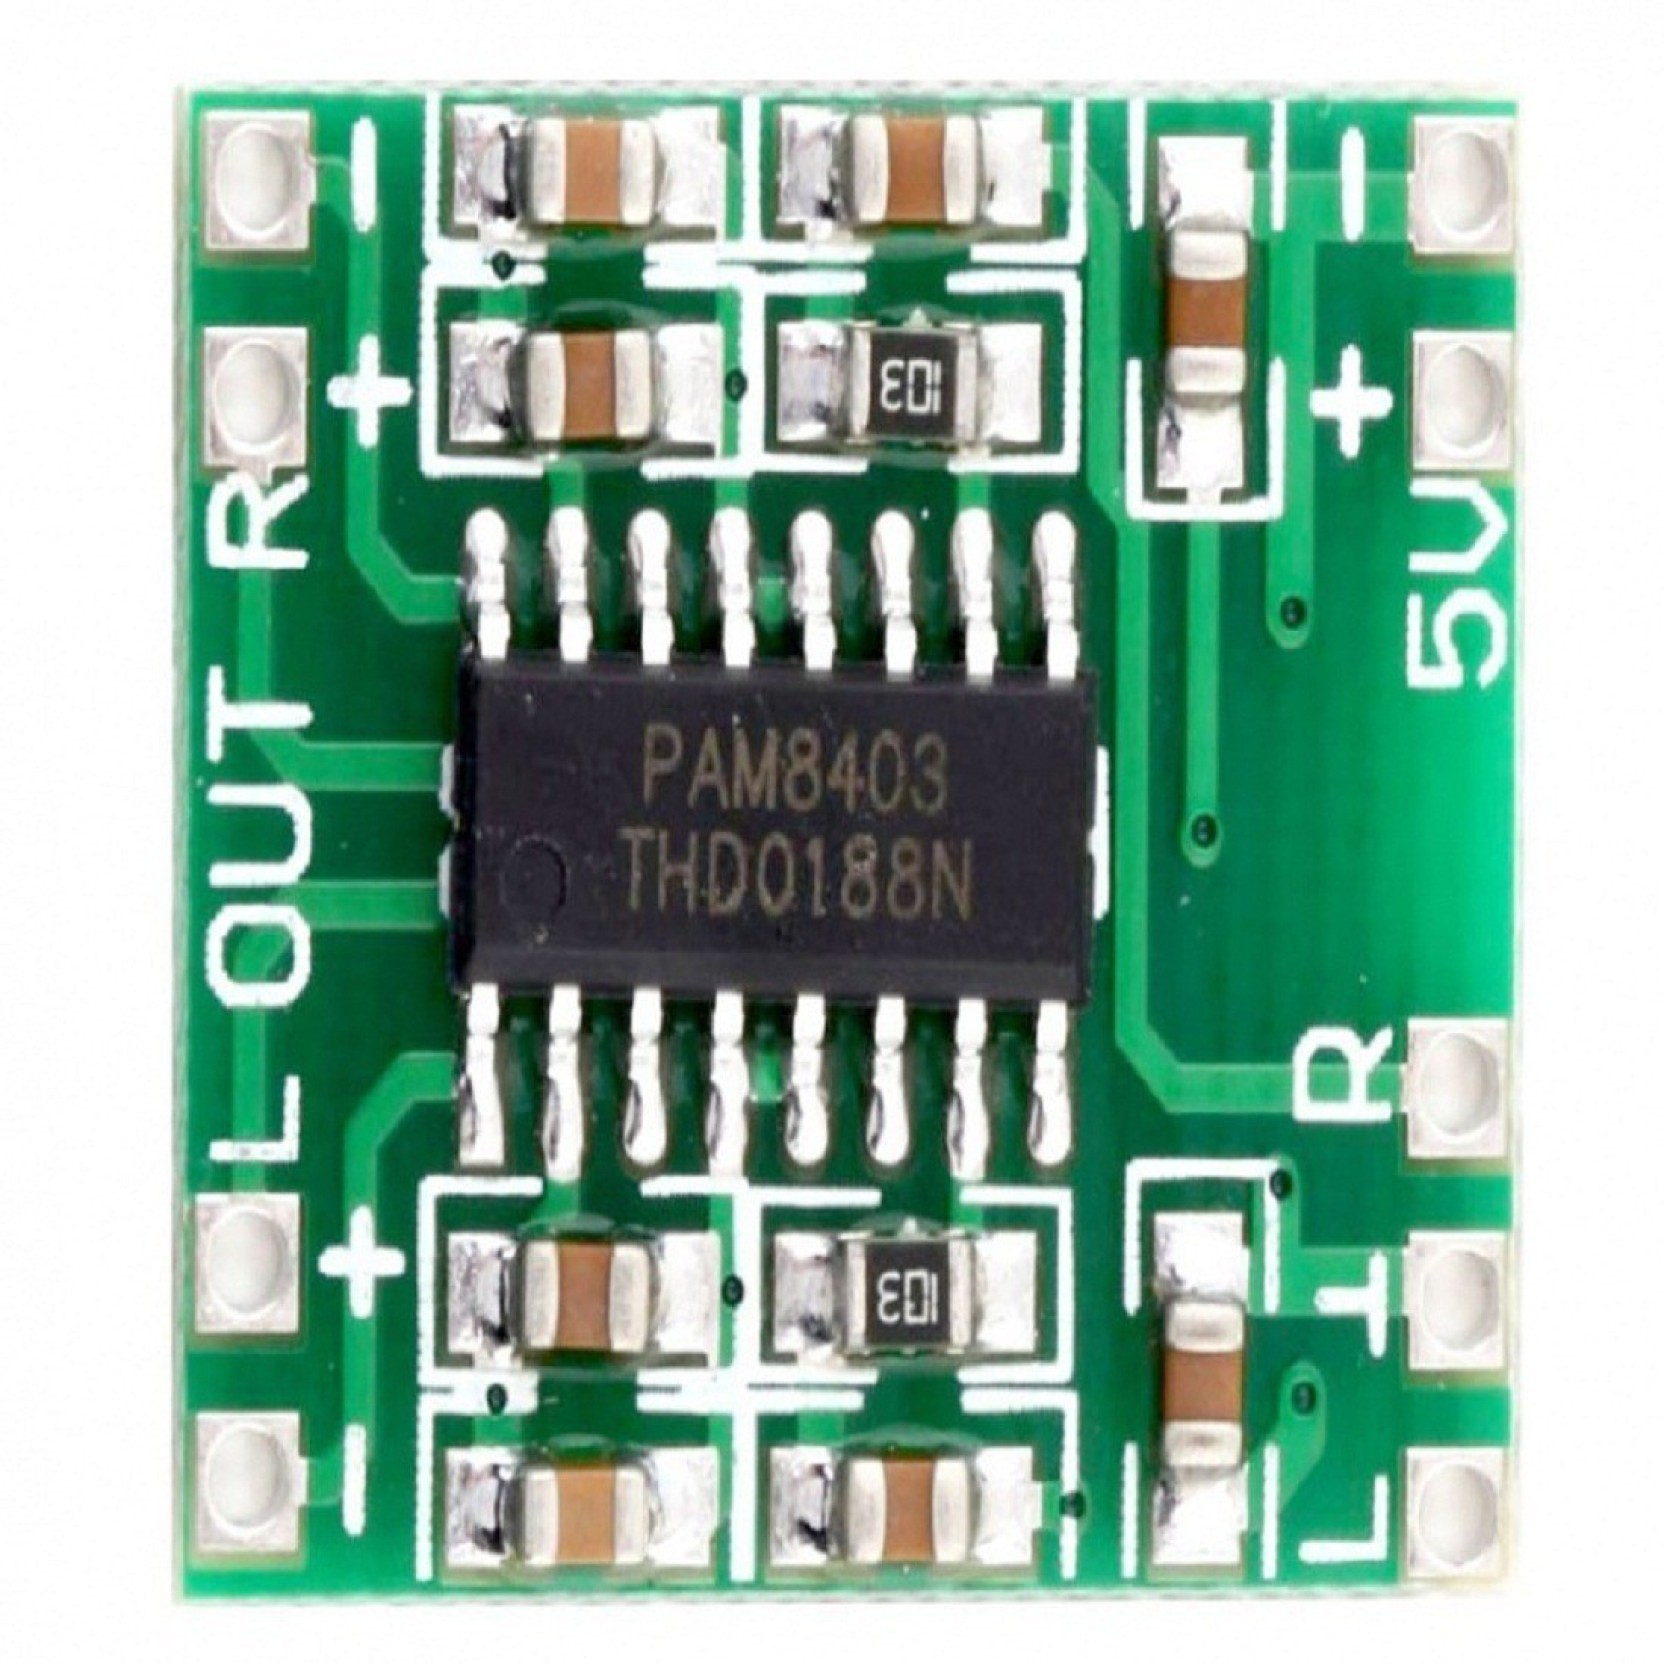 Techwiz 1pcs Pam8403 2x3w Mini Audio Class D Digital Amplifier Board 10w 25 5v Input C698 Educational Electronic Hobby Kit